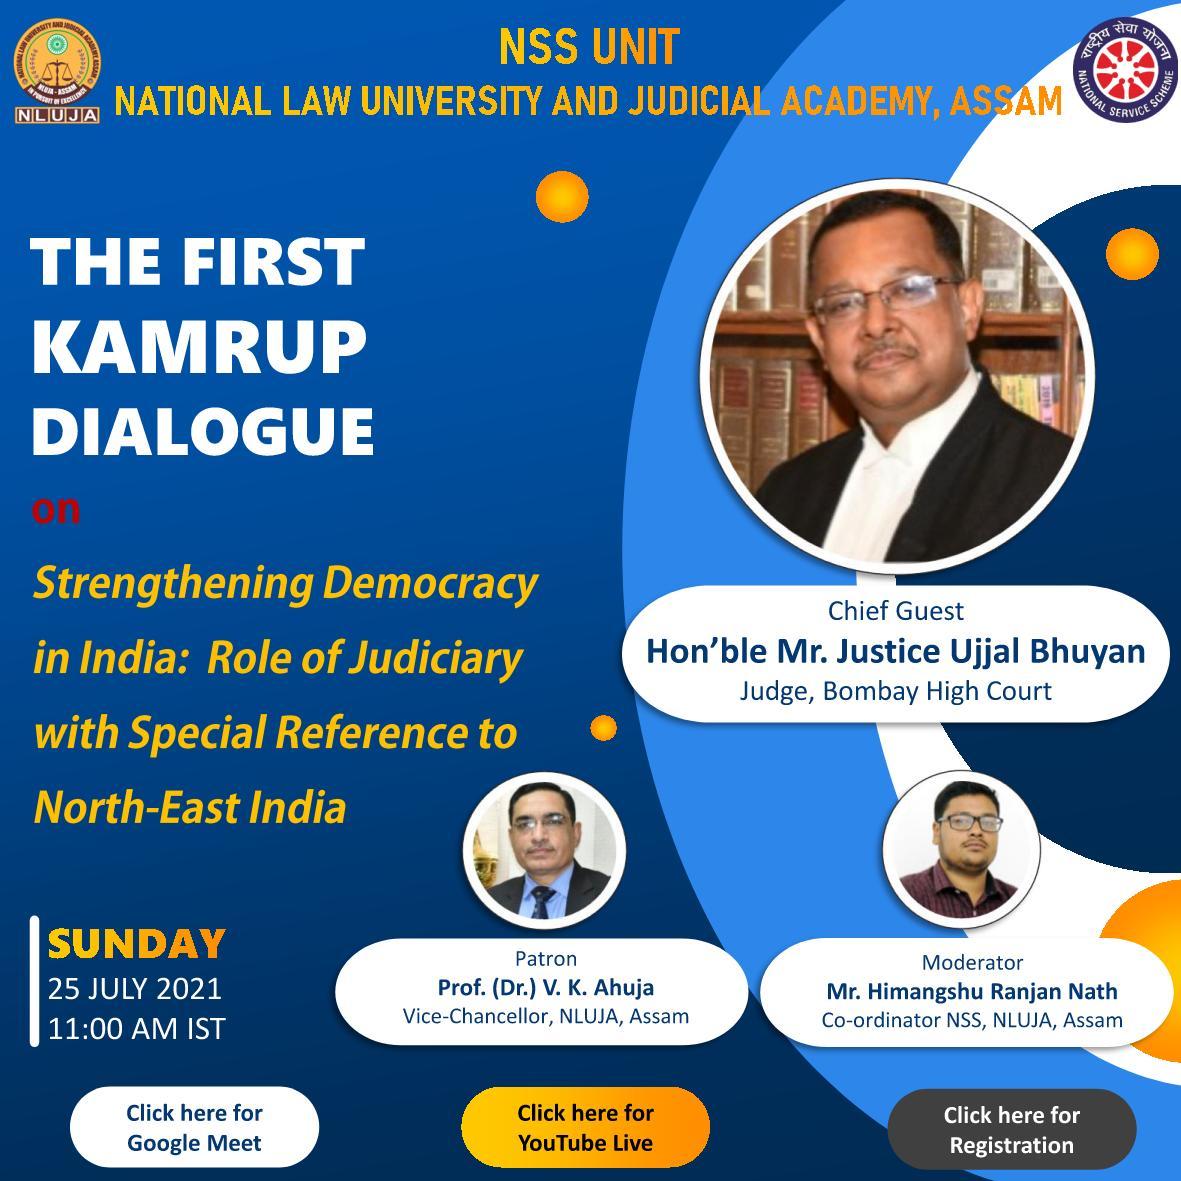 NLU Assam Webinar : The Kamrup Dialogue [Register by 24th July 2021]